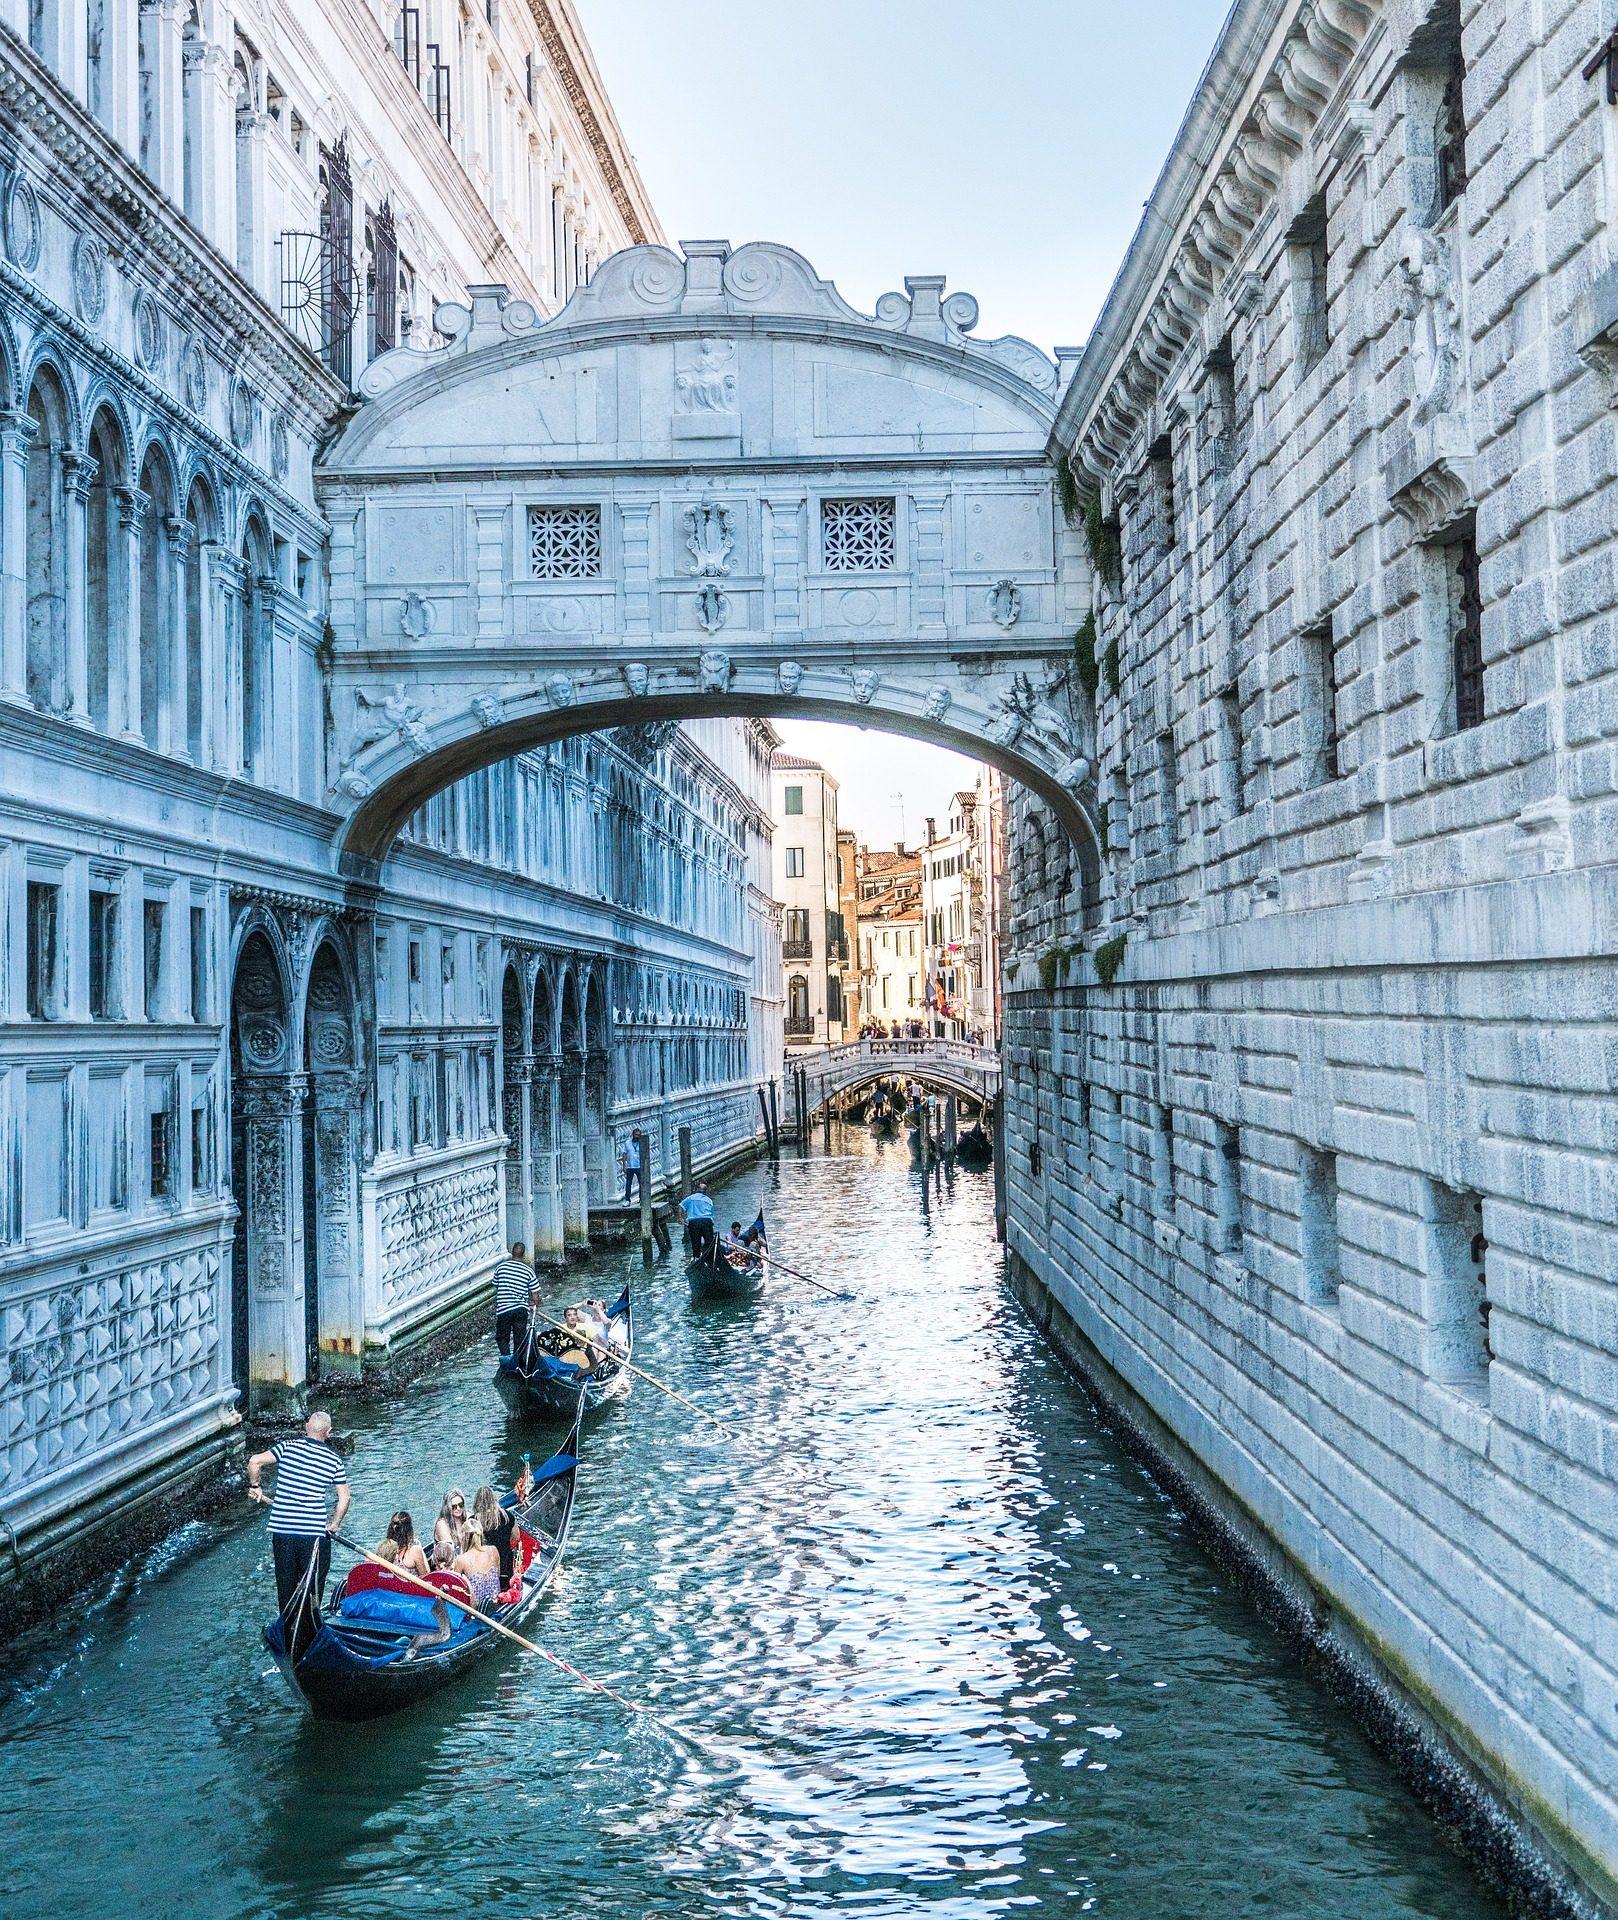 Kanal, Stadt, Gondeln, Gebäude, Wasser, Venedig - Wallpaper HD - Prof.-falken.com